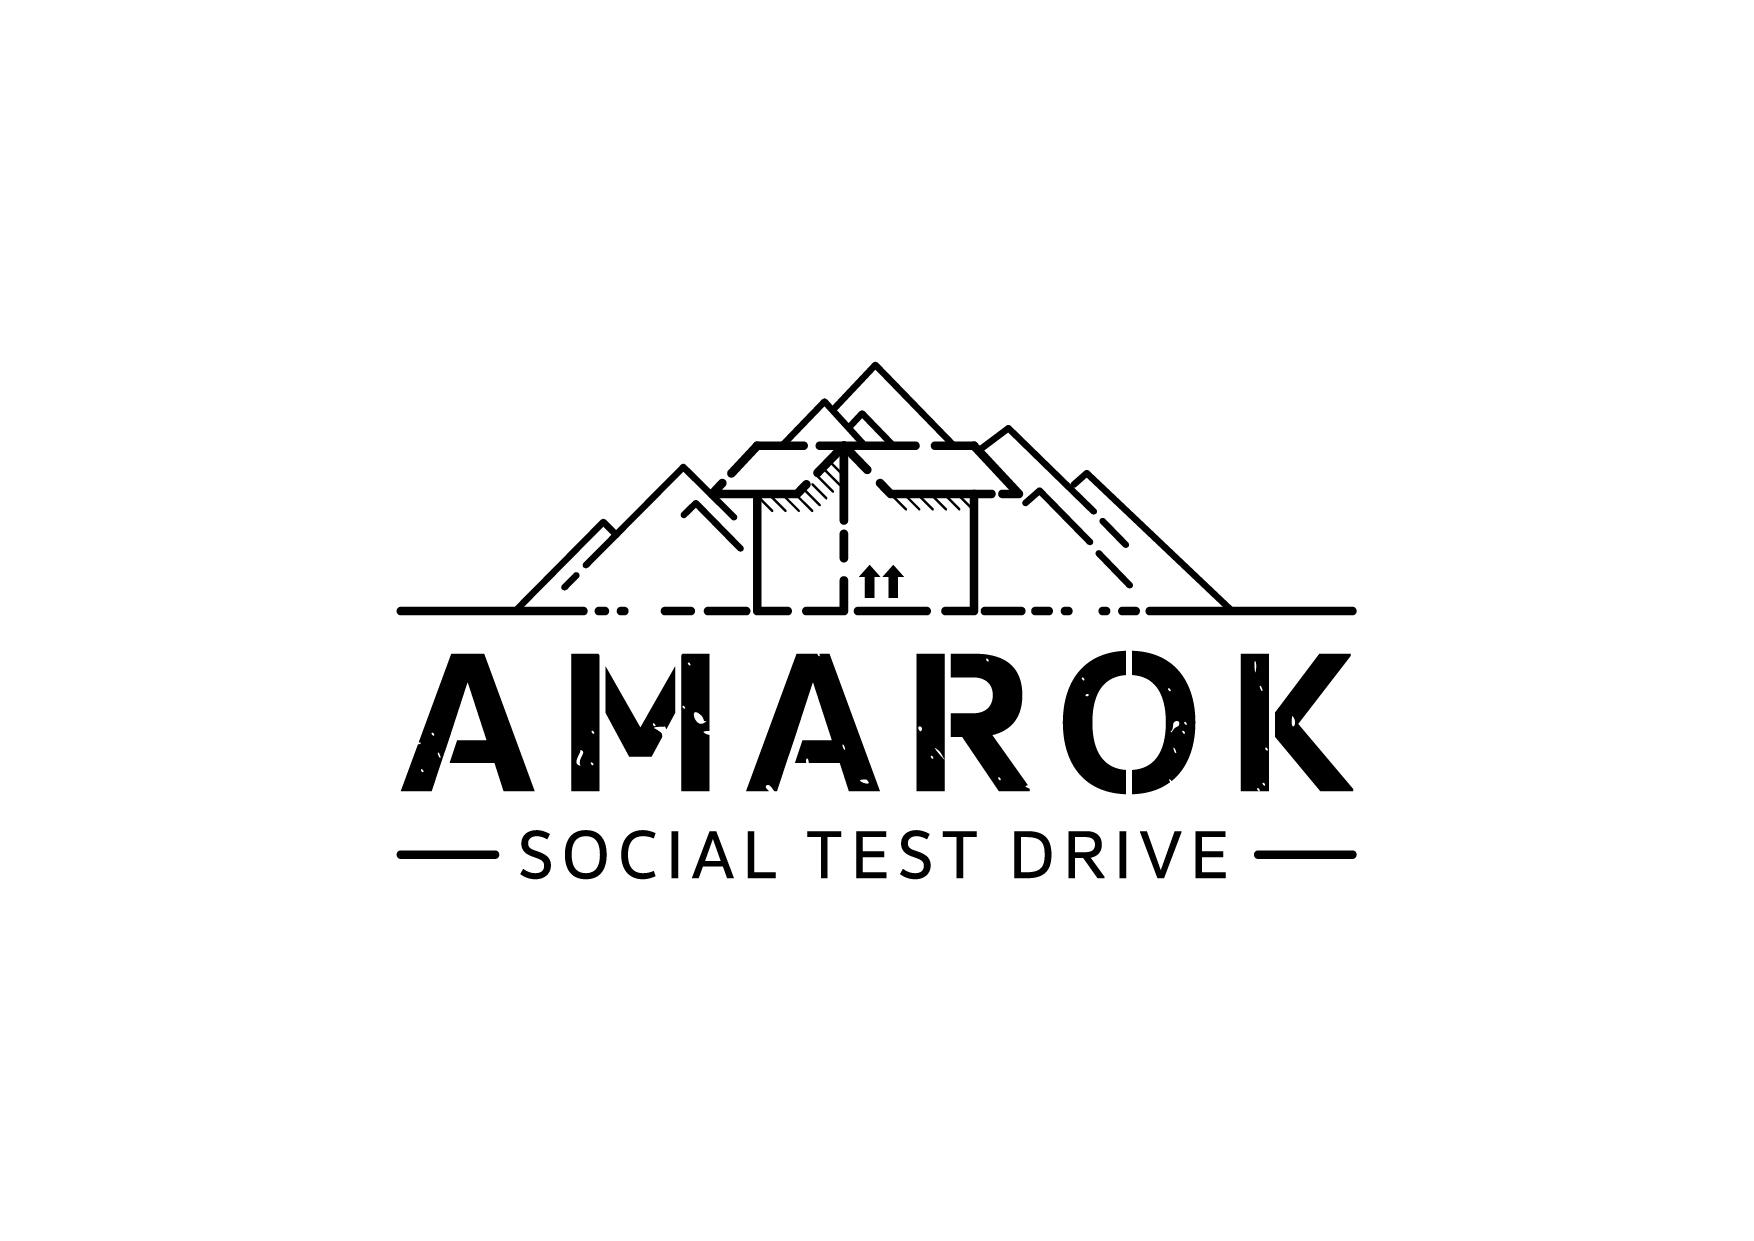 AMAROK_STD_LOGO-01.jpg